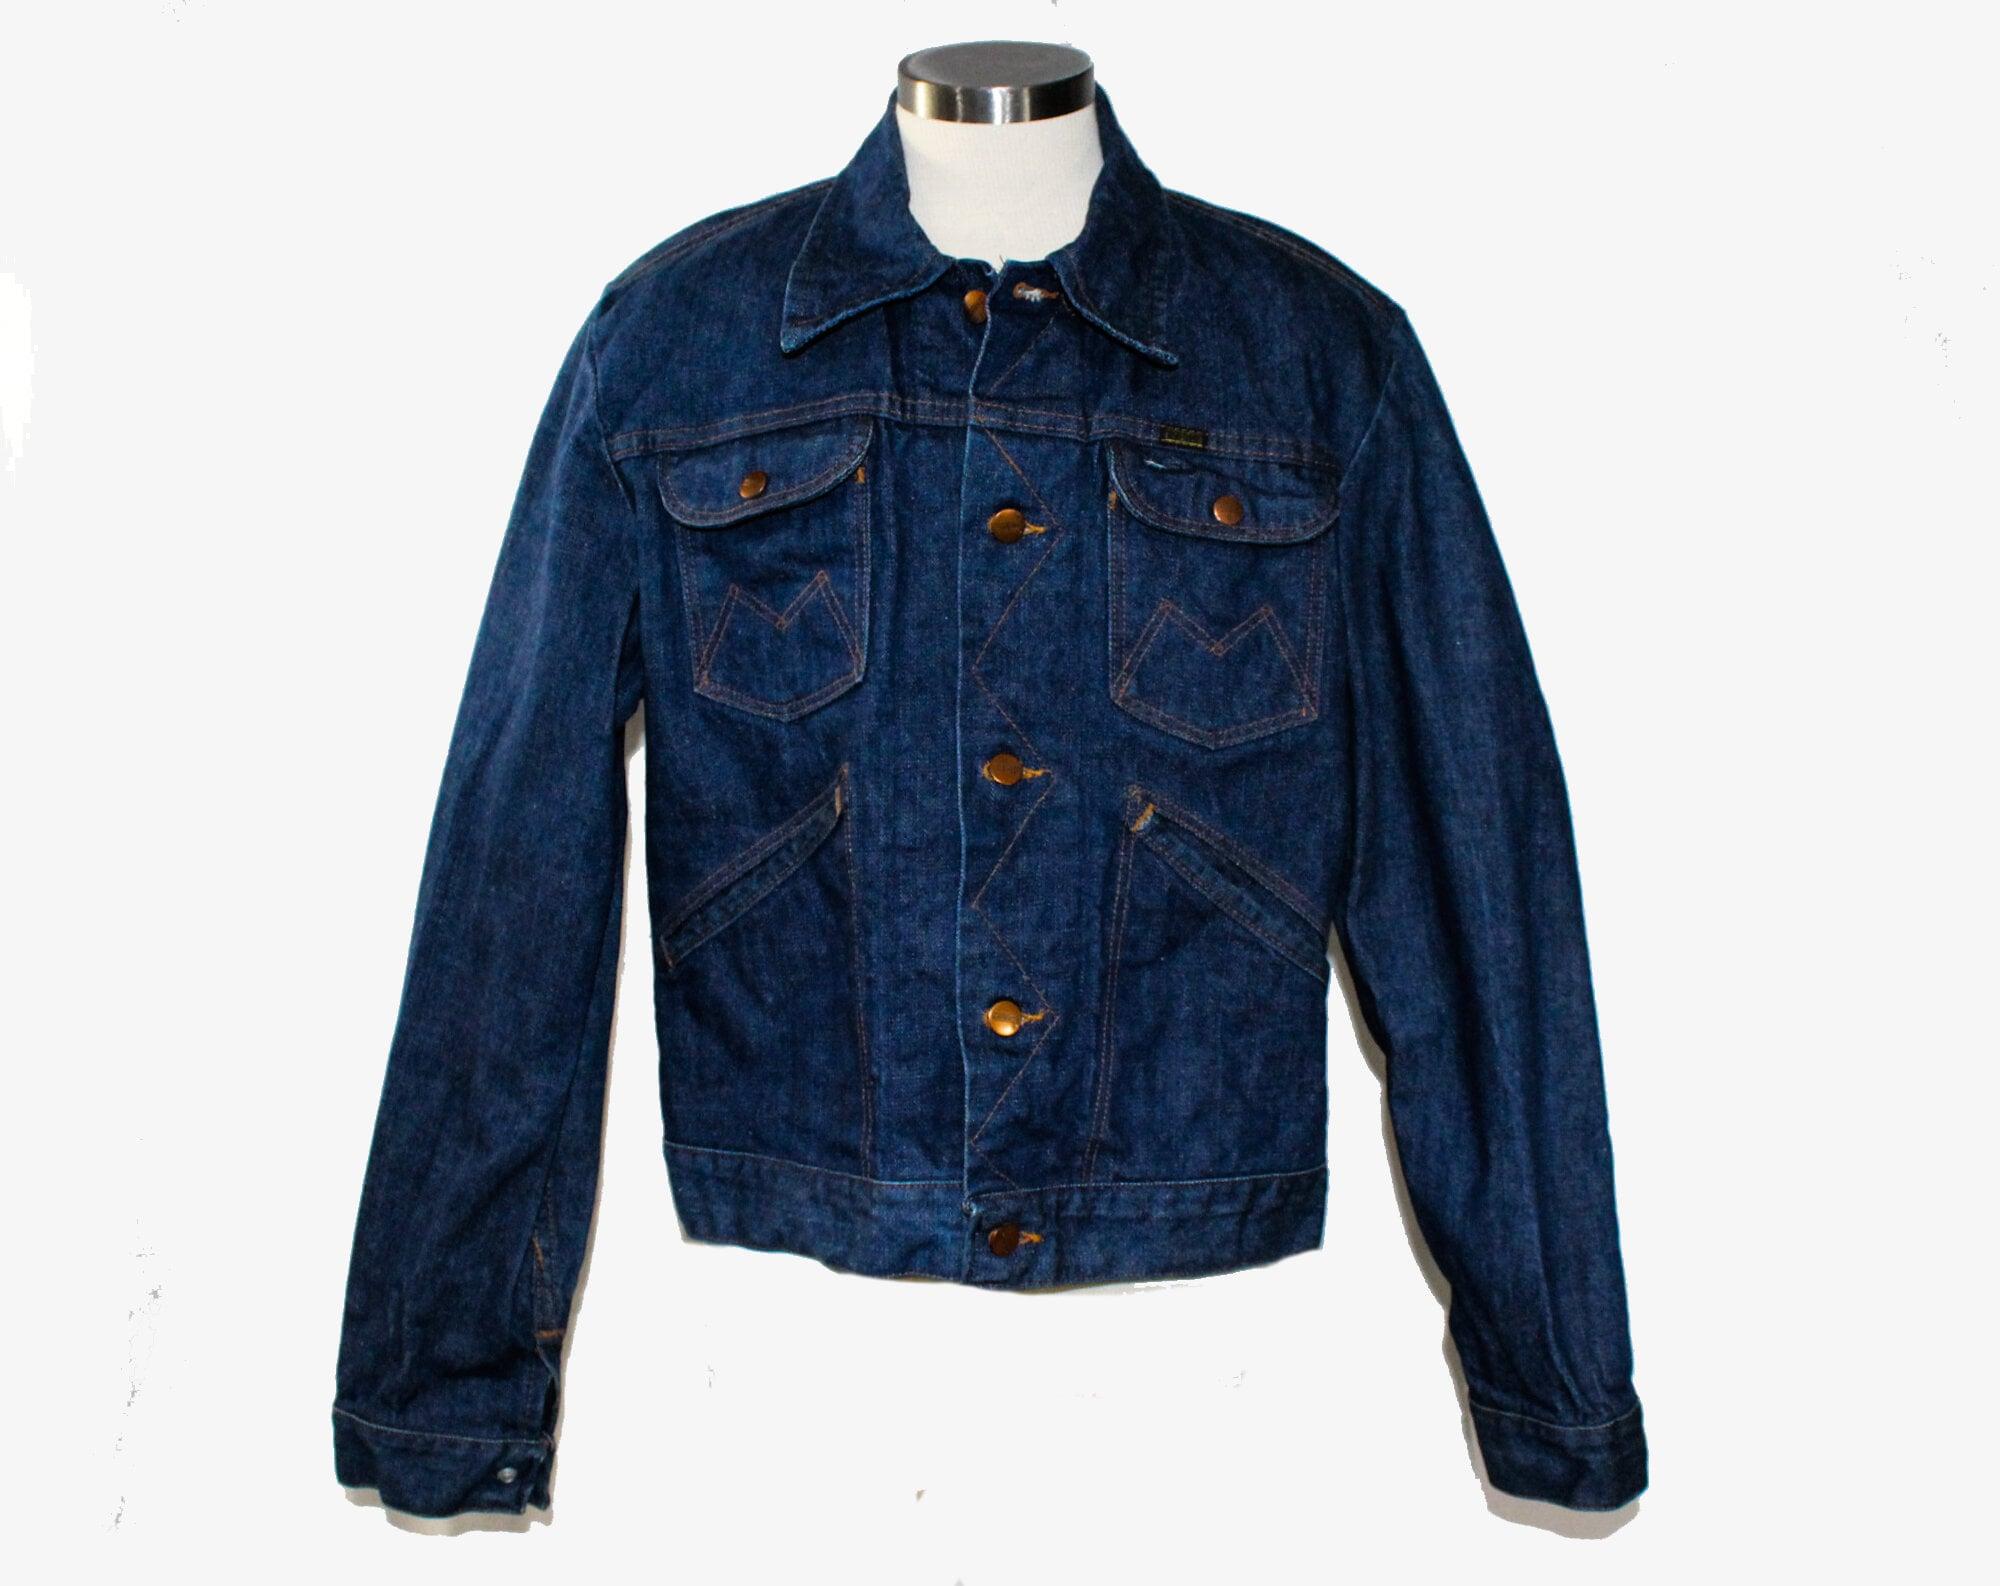 1960s – 70s Men's Ties | Skinny Ties, Slim Ties Mens Small Jean Jacket - 60S Maverick Label Cotton Denim Cropped Waist 1960S Work Wear Great Patina Vintage Blue Bell Chest 40 $40.45 AT vintagedancer.com